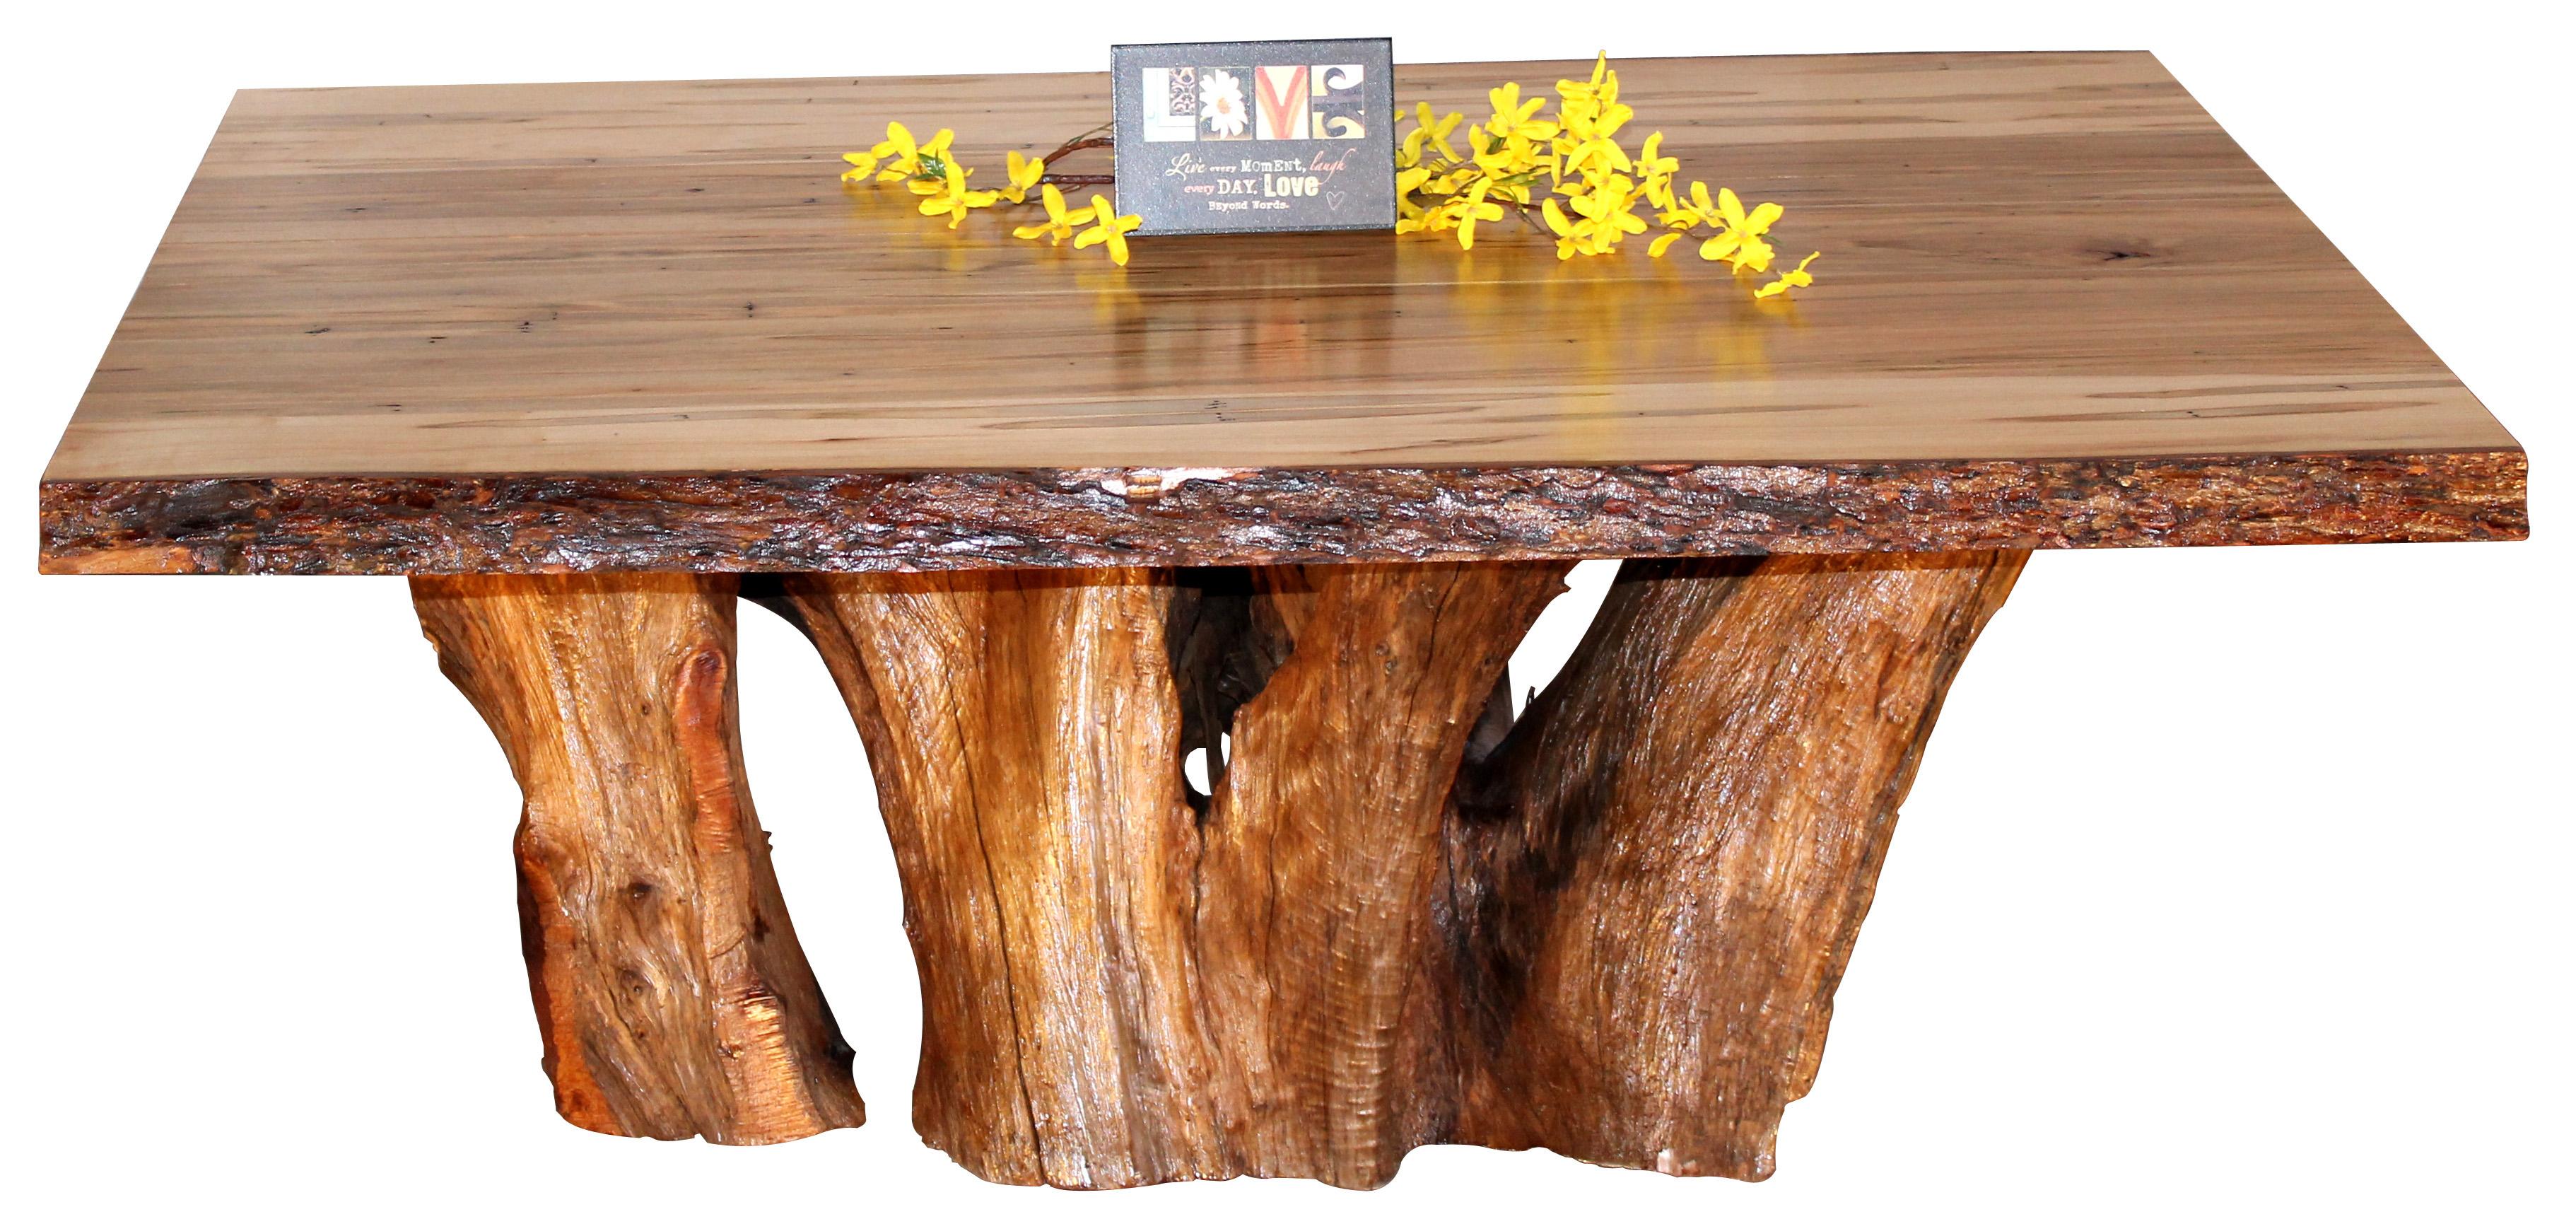 Ambrosia Maple Coffee Table With Cedar Stump Base